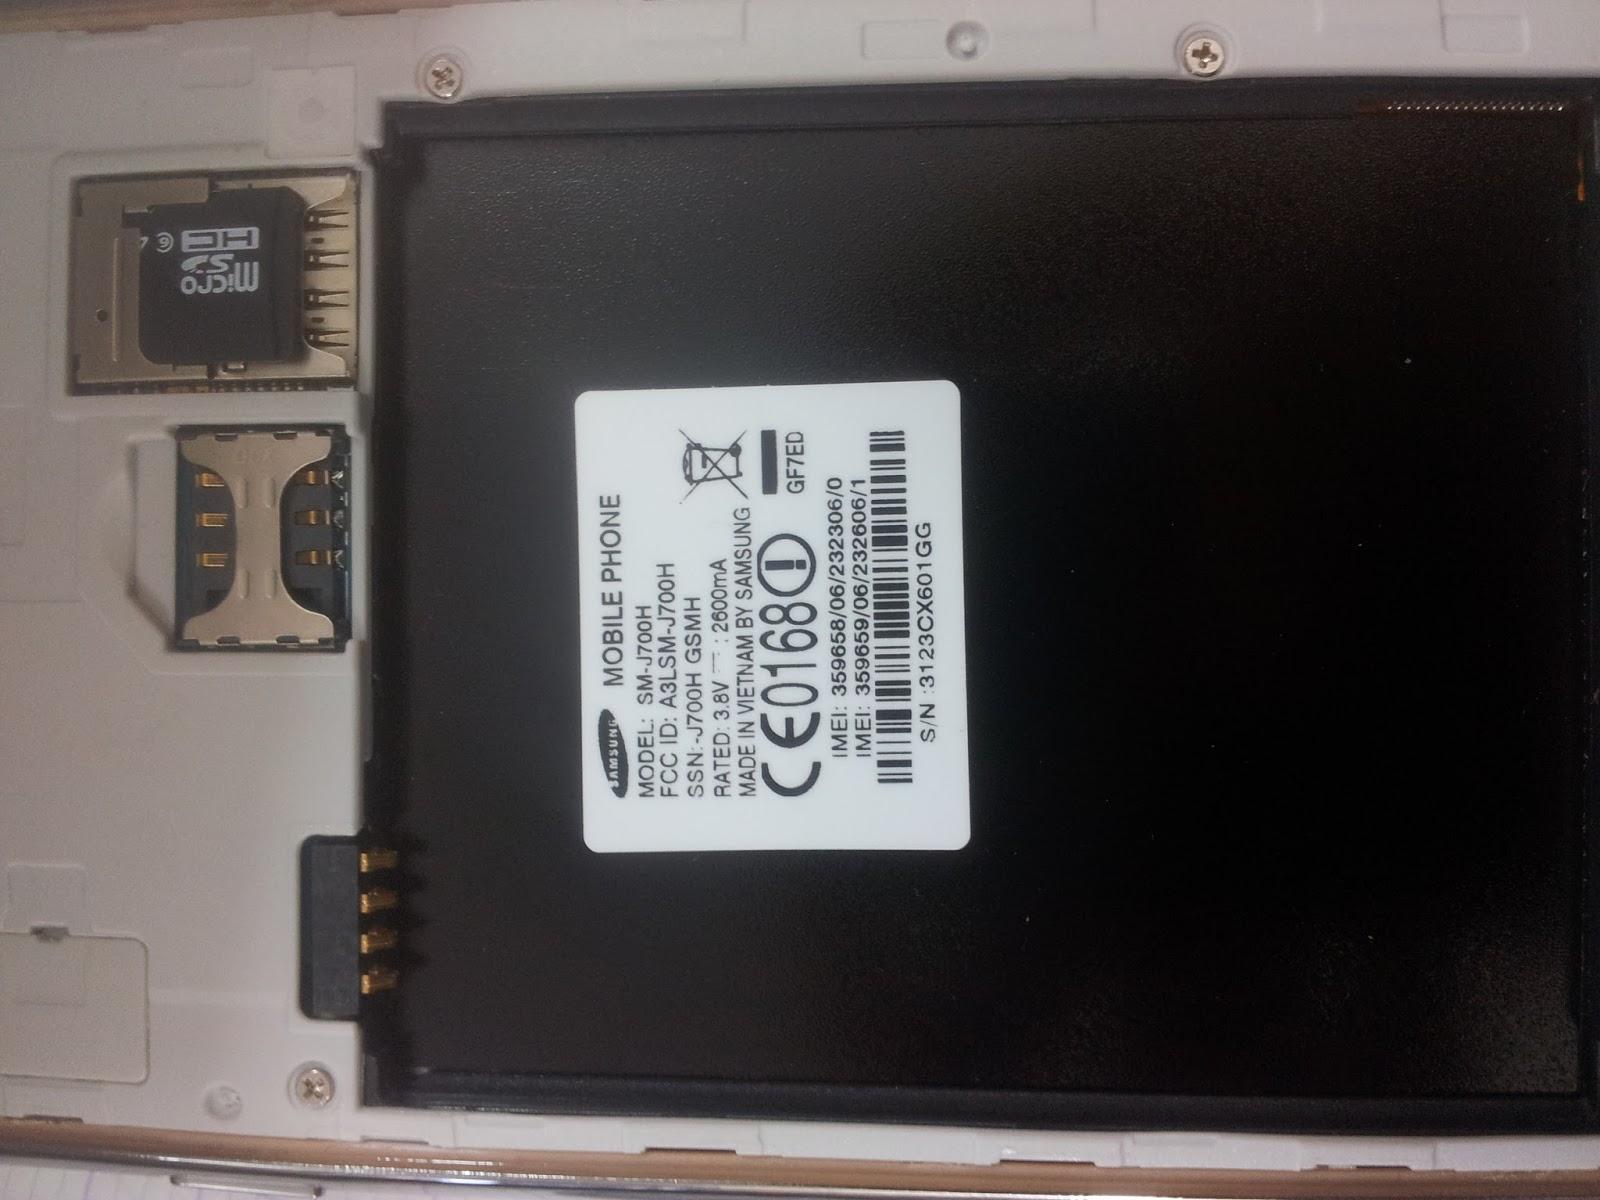 Samsung j700h firmware - Samsung Galaxy J7 Sm J700h Clone Firmware Readed As Sm G530f